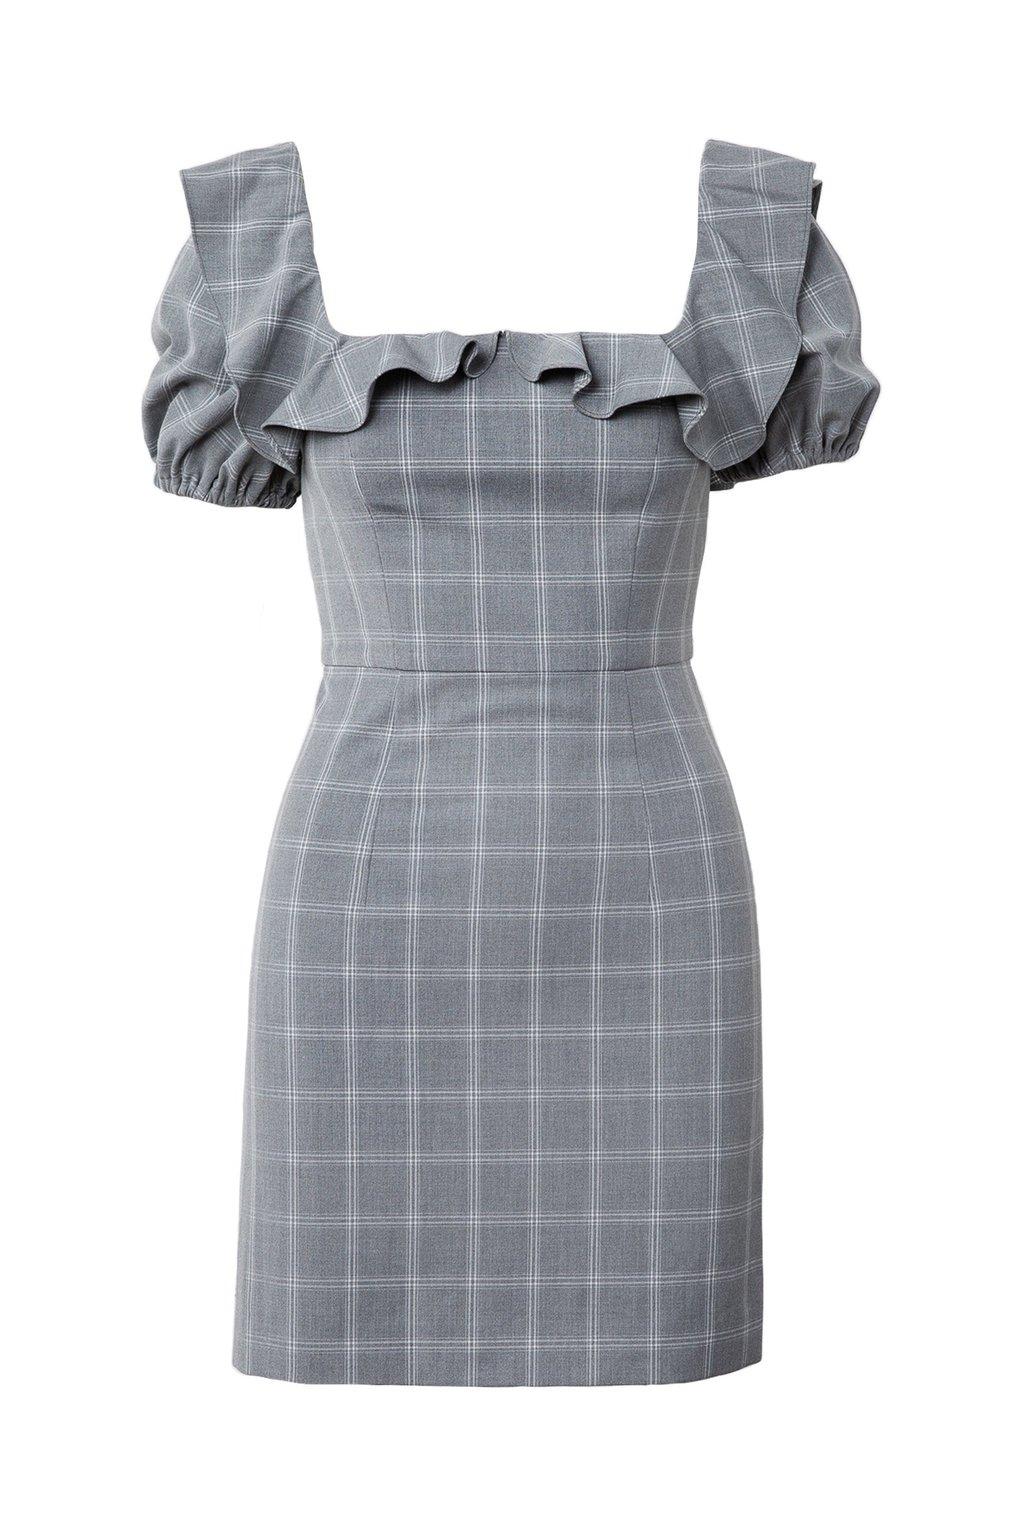 Petunia Plaid Dress by J.ING women's clothing